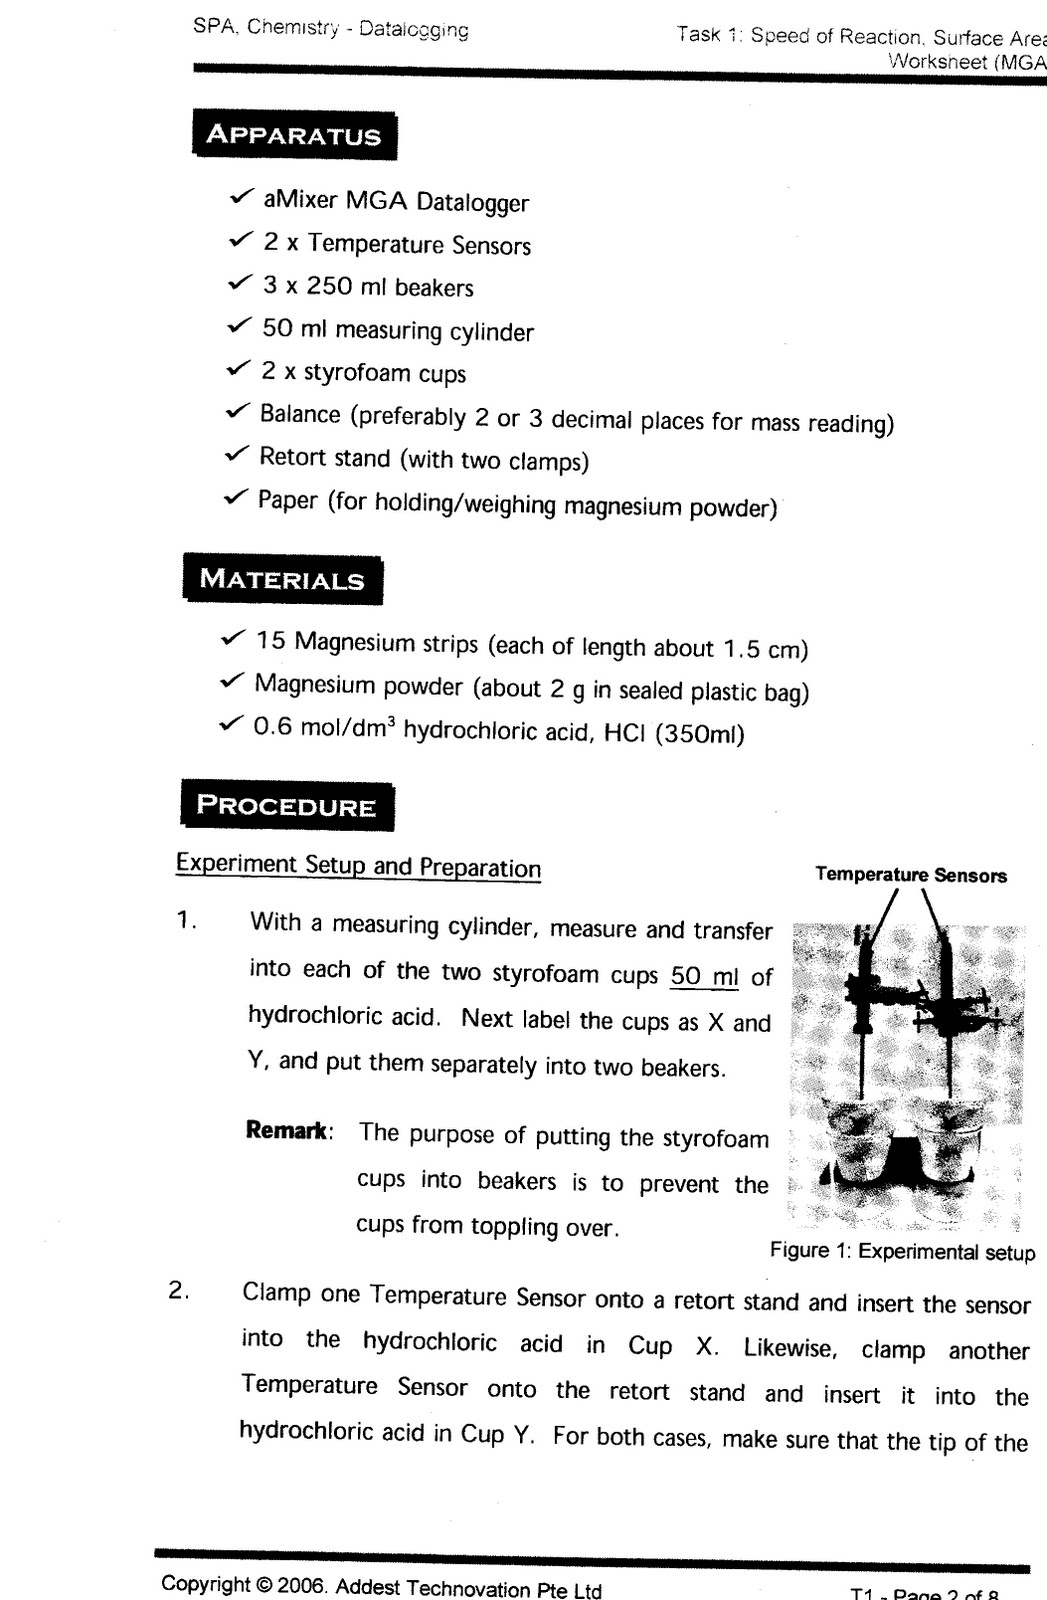 Ict In Education Spa Worksheet Chemistry